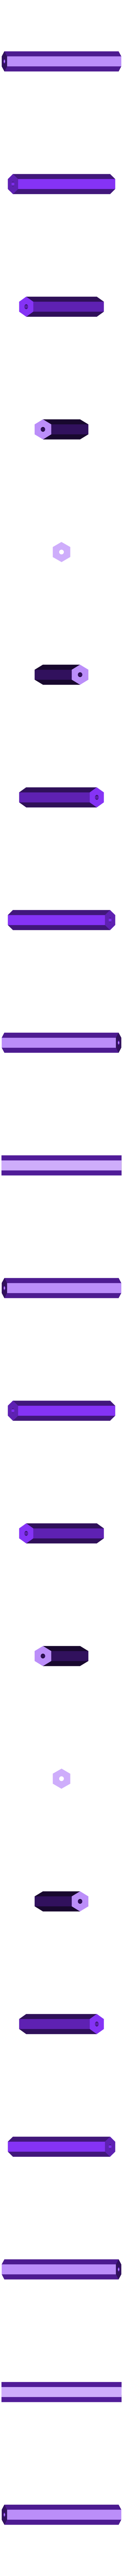 handle_bar.stl Download free STL file Guardian Shield+ Zelda Breath of the Wild • 3D print object, Adafruit